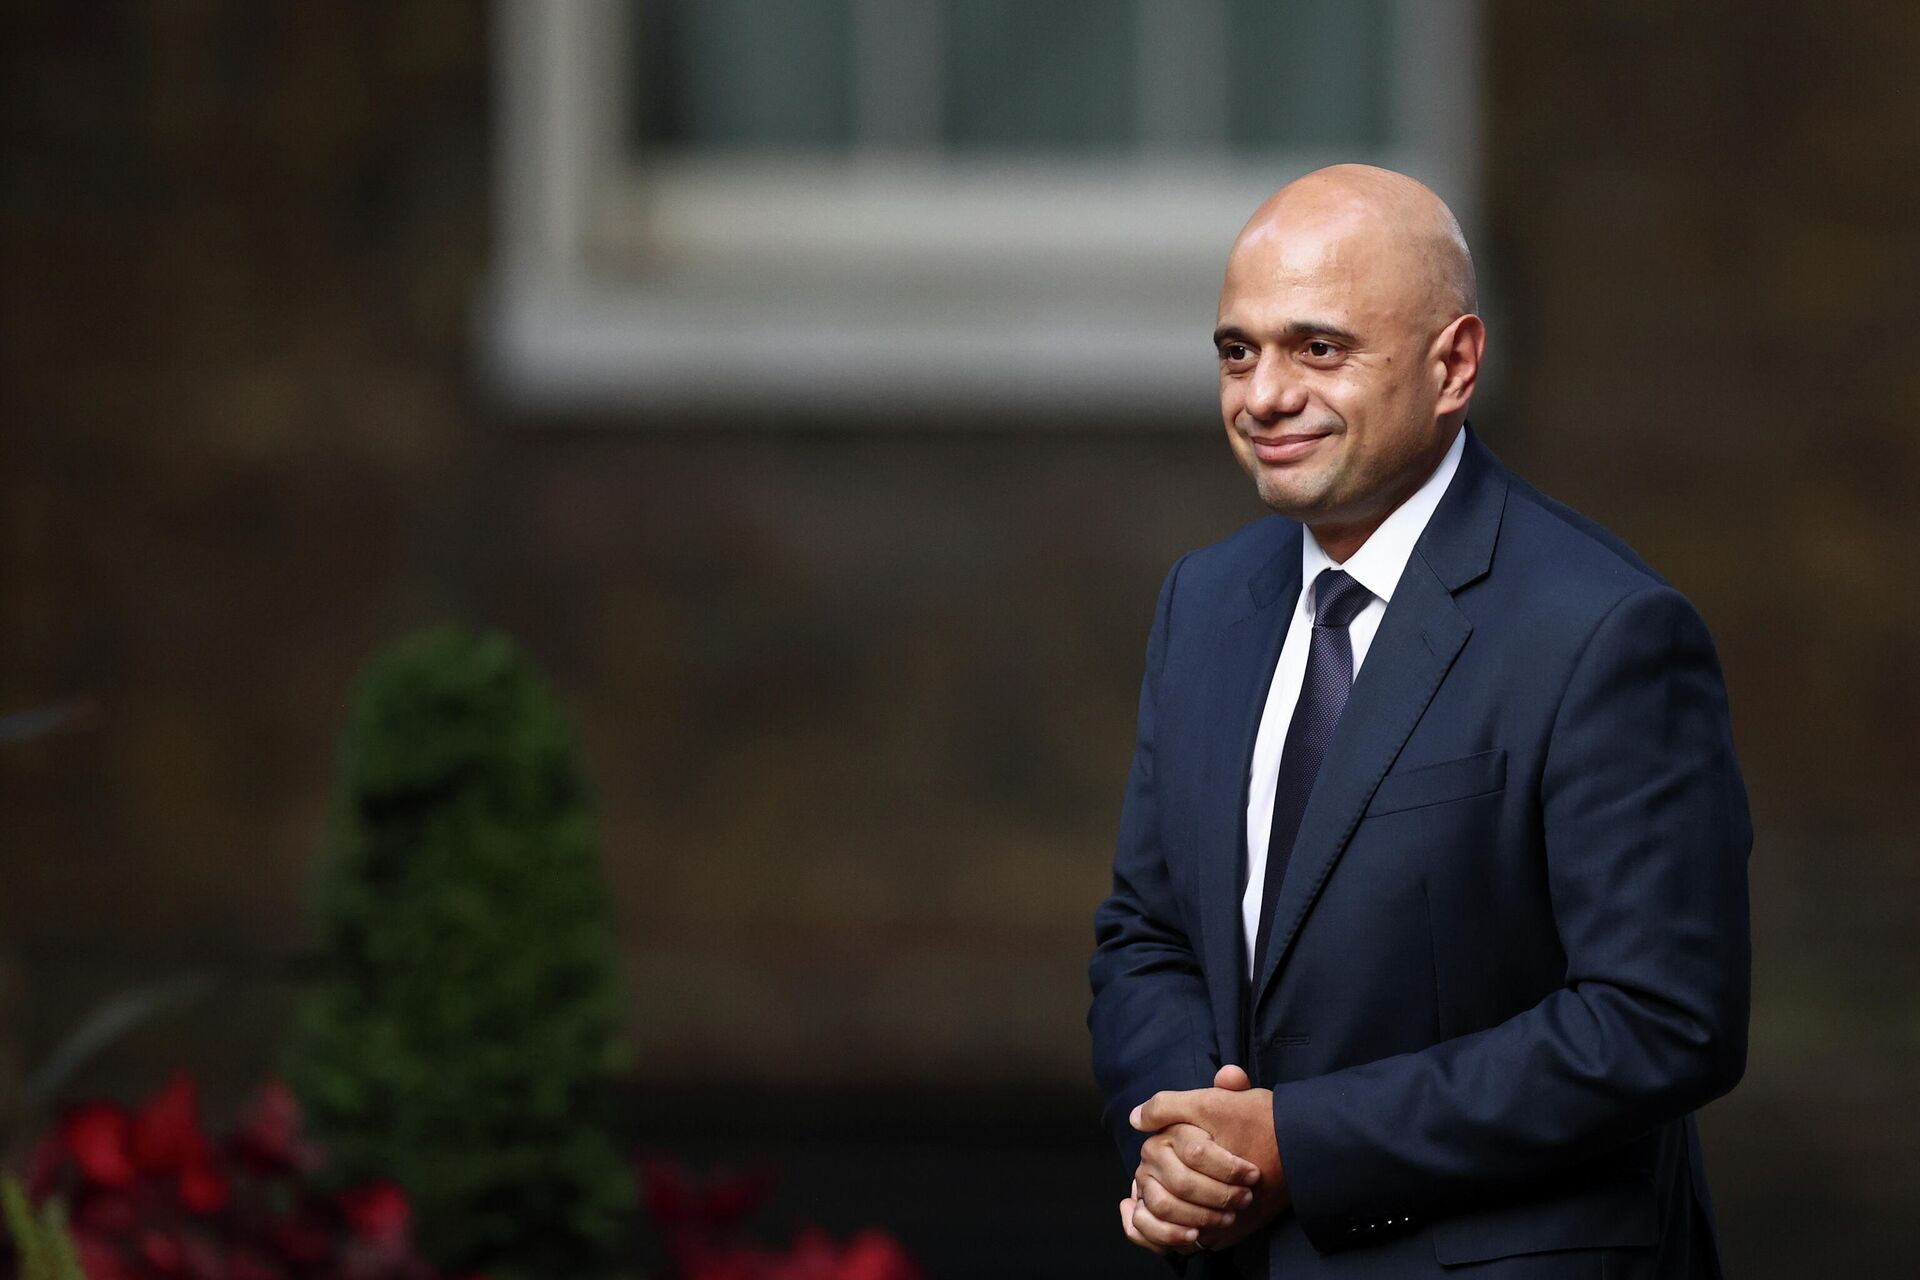 Britain's Secretary of State for Health and Social Care Sajid Javid walks outside Downing Street in London - Sputnik International, 1920, 12.10.2021